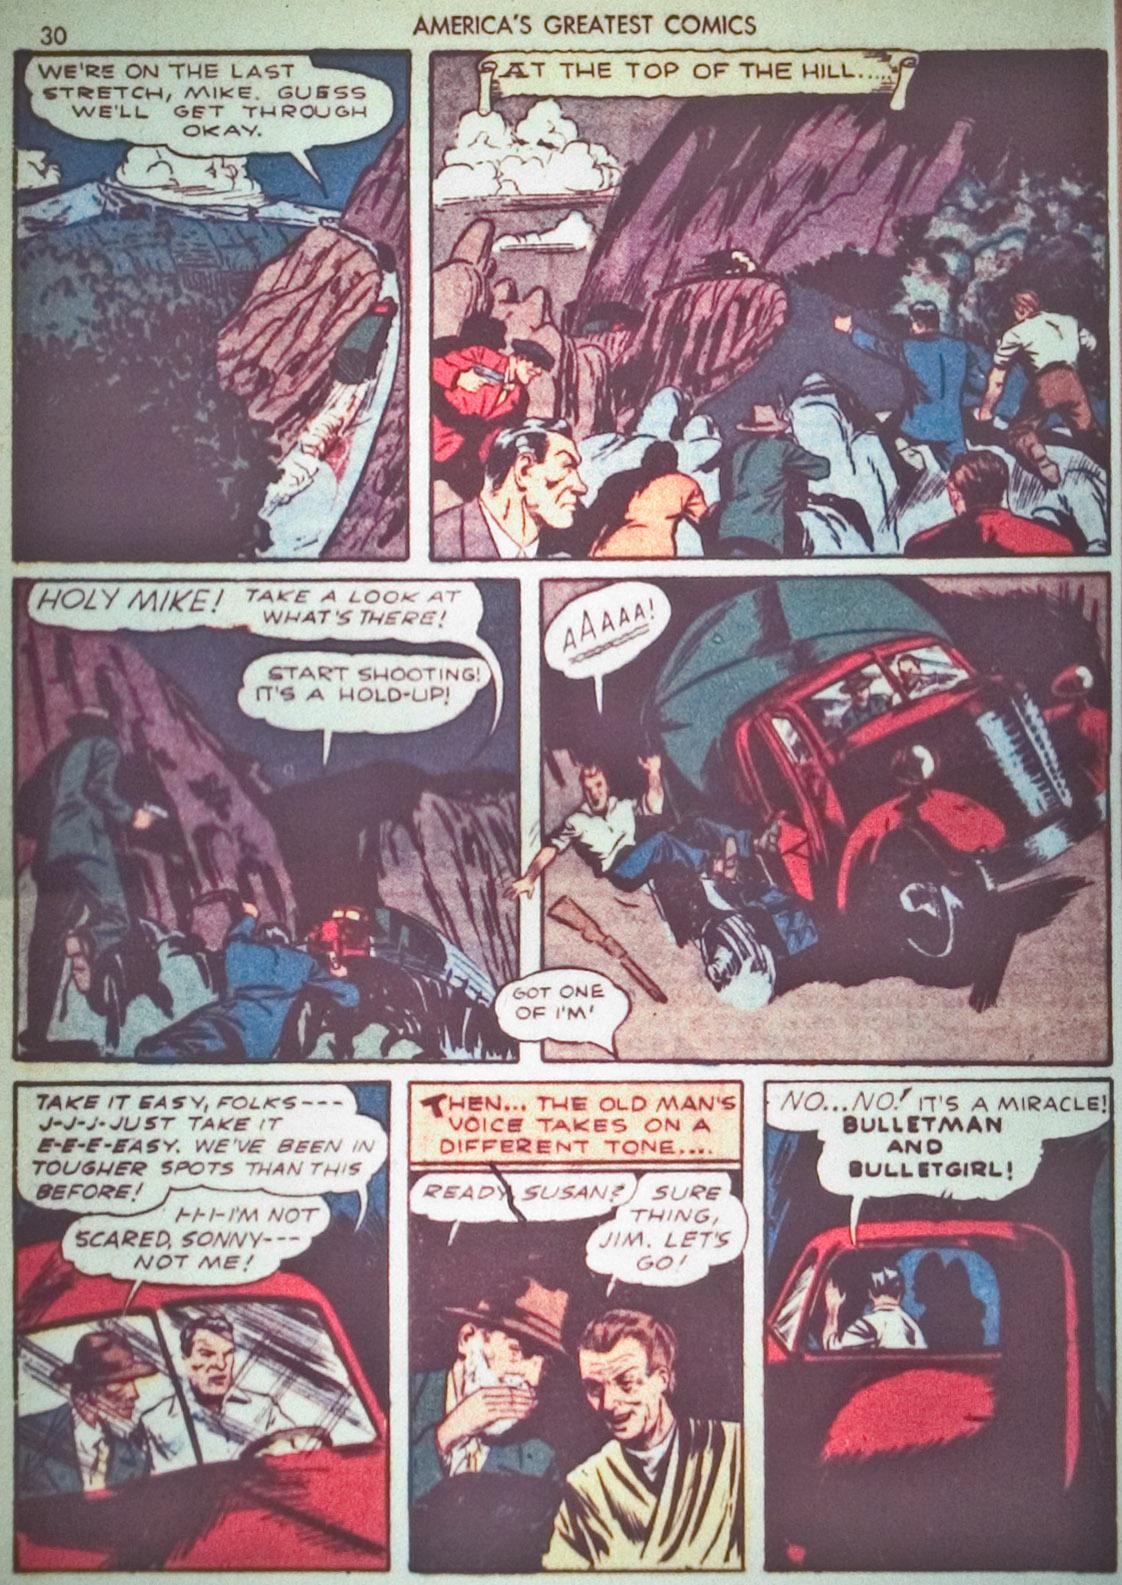 Read online America's Greatest Comics comic -  Issue #1 - 33